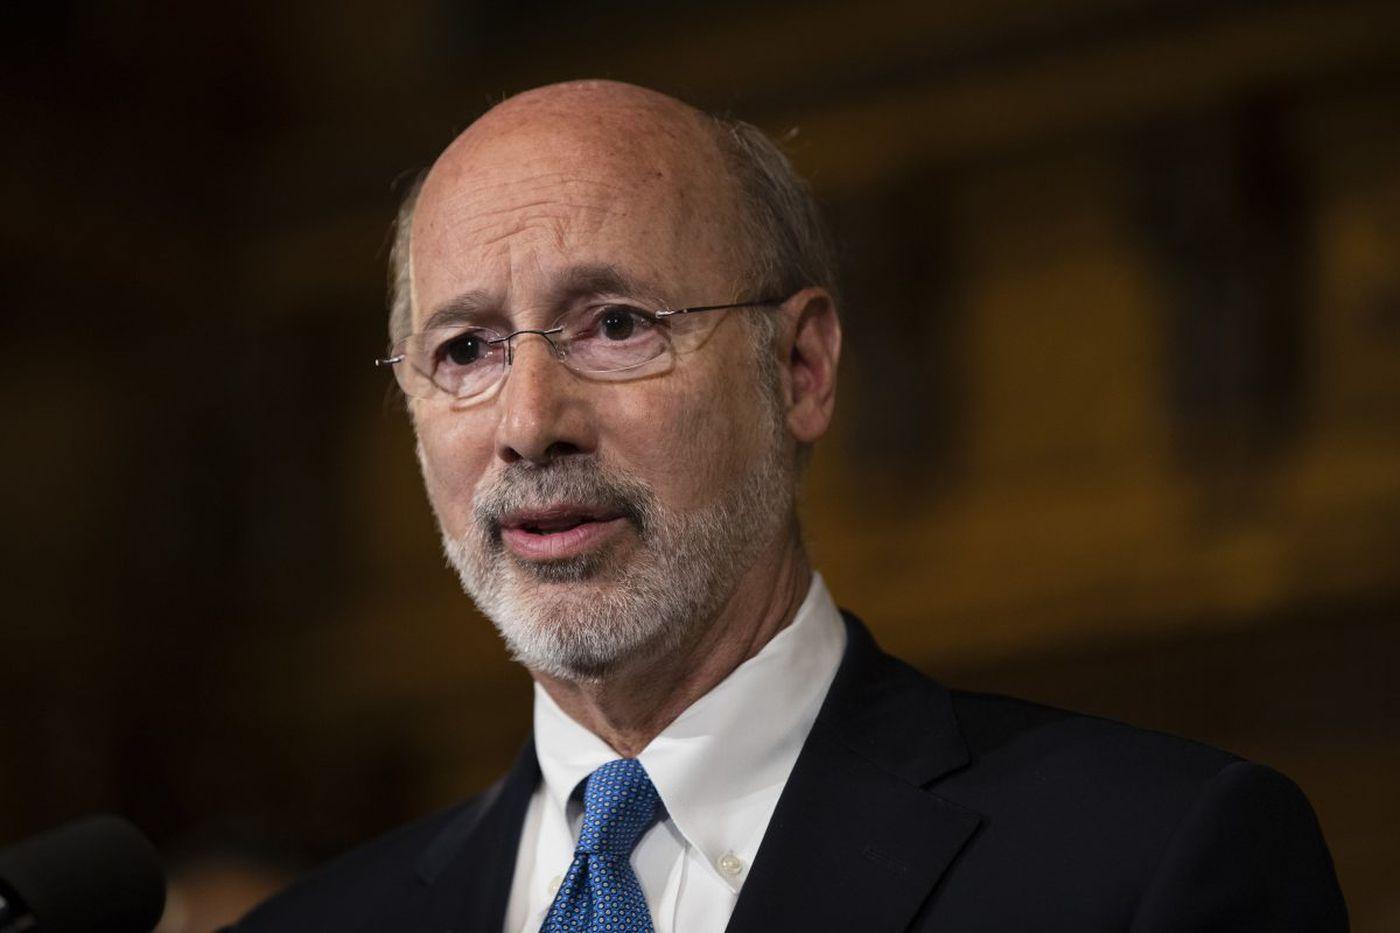 Pa. legislators move to overhaul public employee pensions